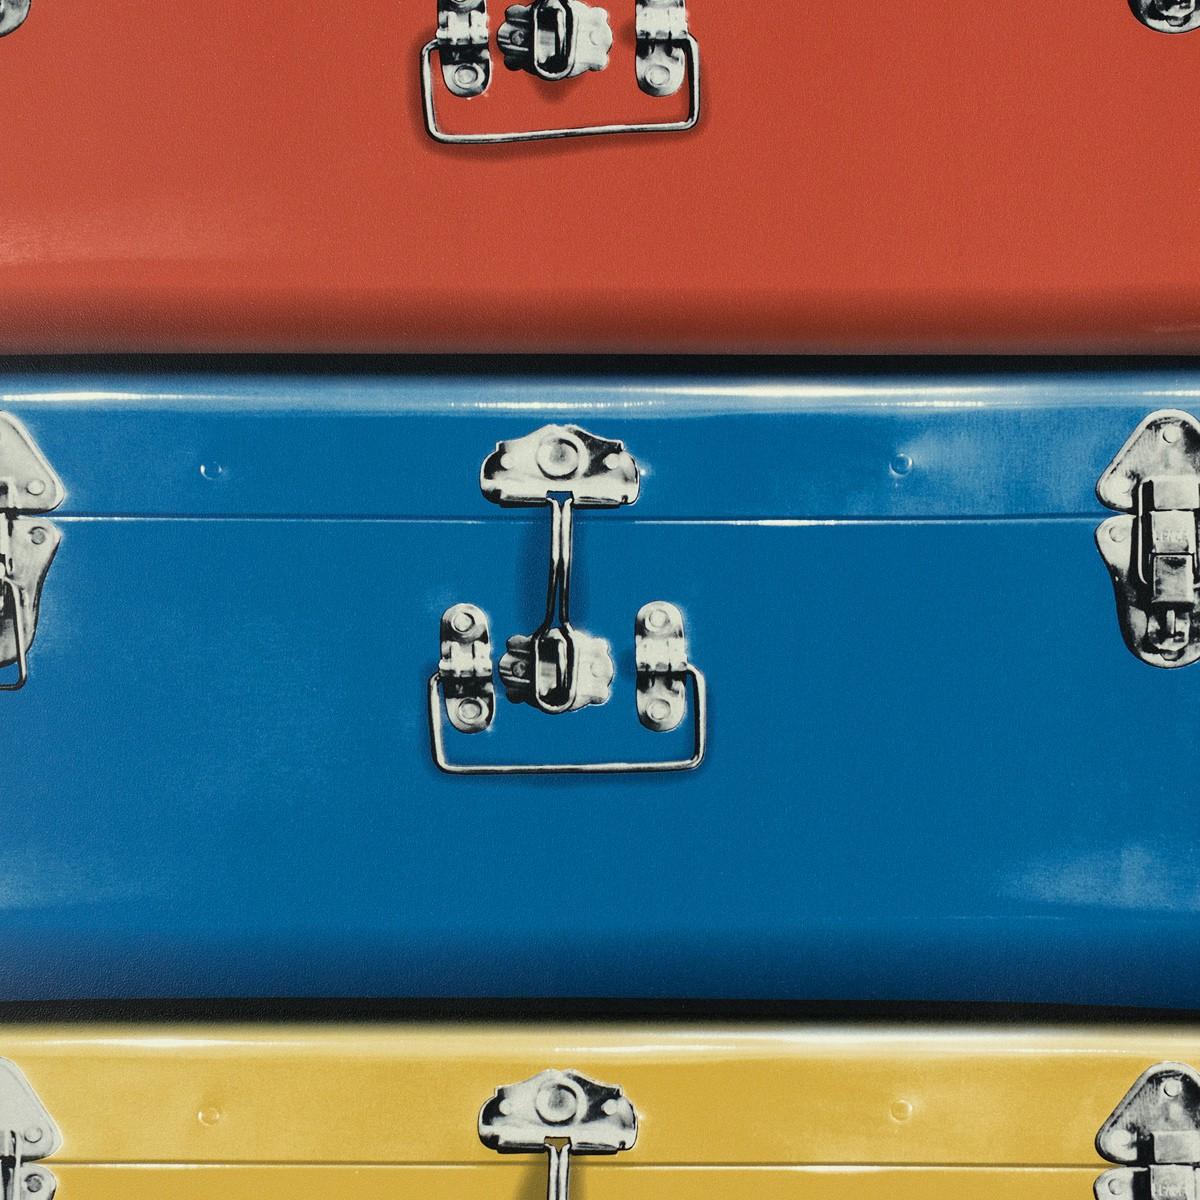 tapete koffer rot blau gelbgold tapeten rasch textil new age 319858. Black Bedroom Furniture Sets. Home Design Ideas